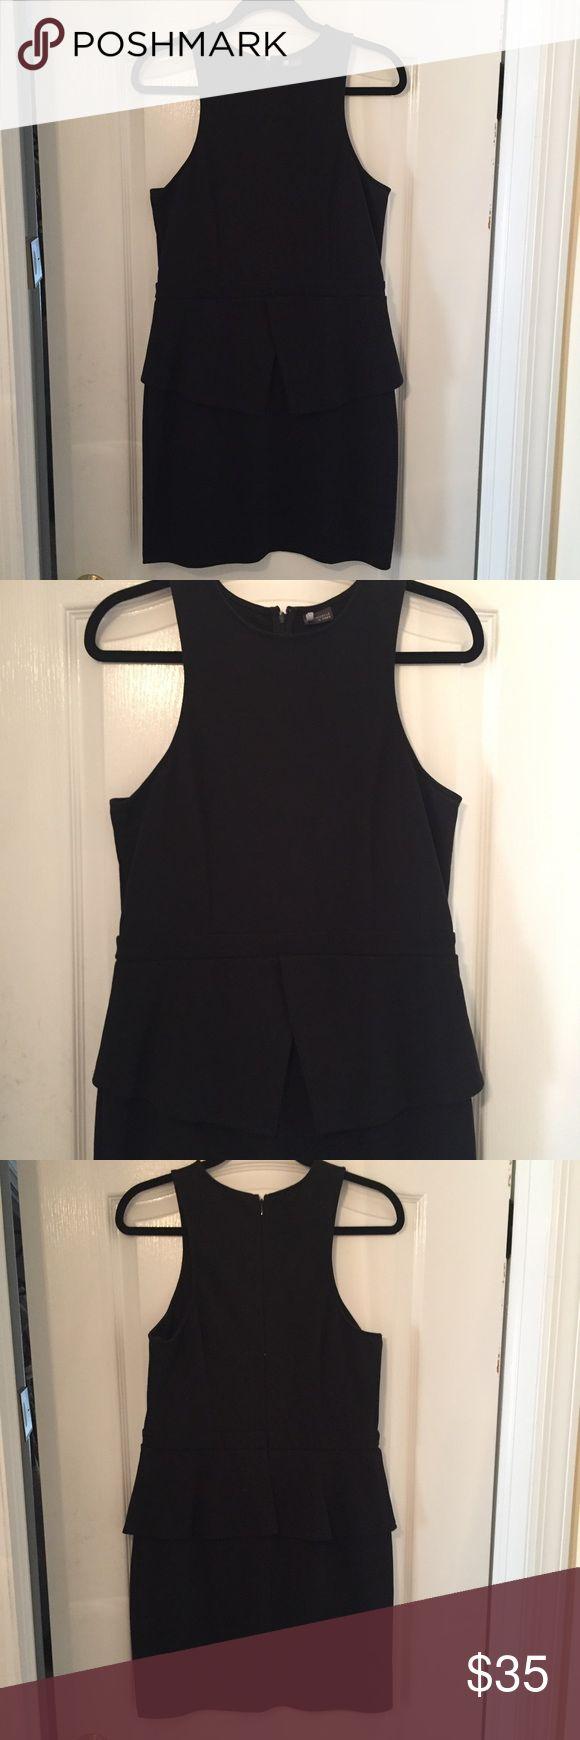 Urban Outfitters Black Peplum Dress Sparkle + Fade Black Peplum Dress Urban Outfitters Dresses